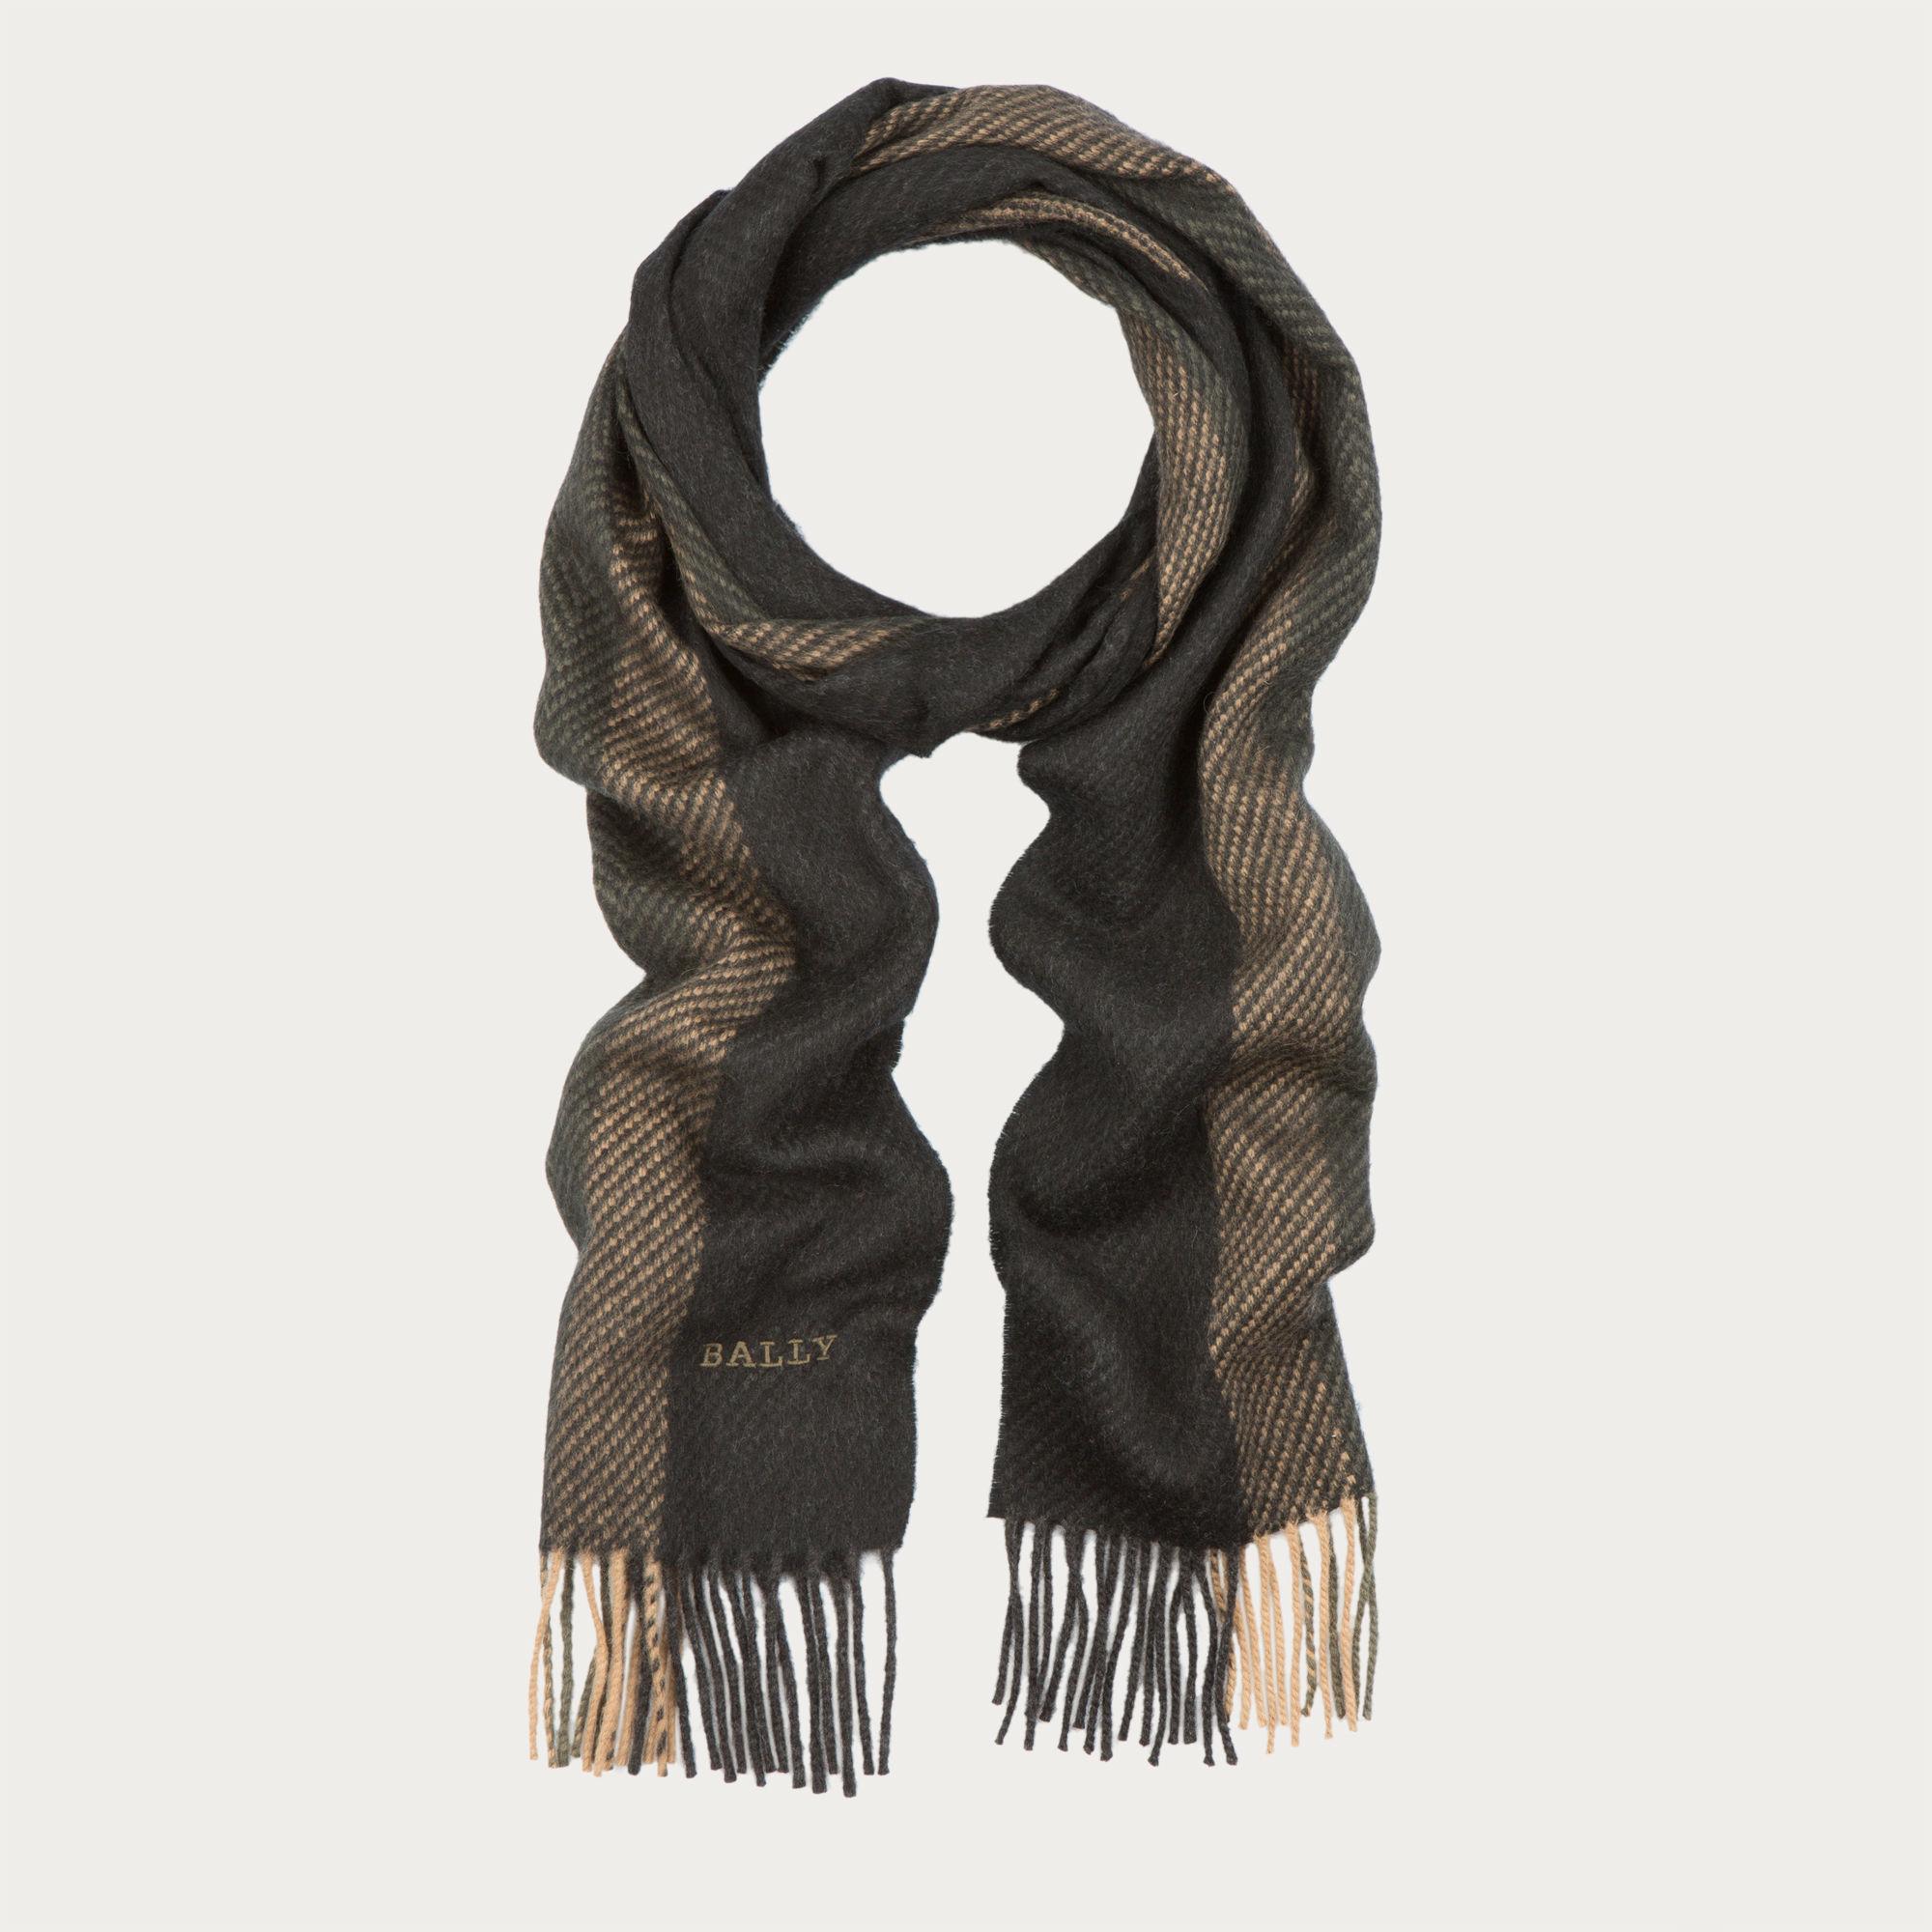 bally wool jacquard scarf s mix wool scarf in multi